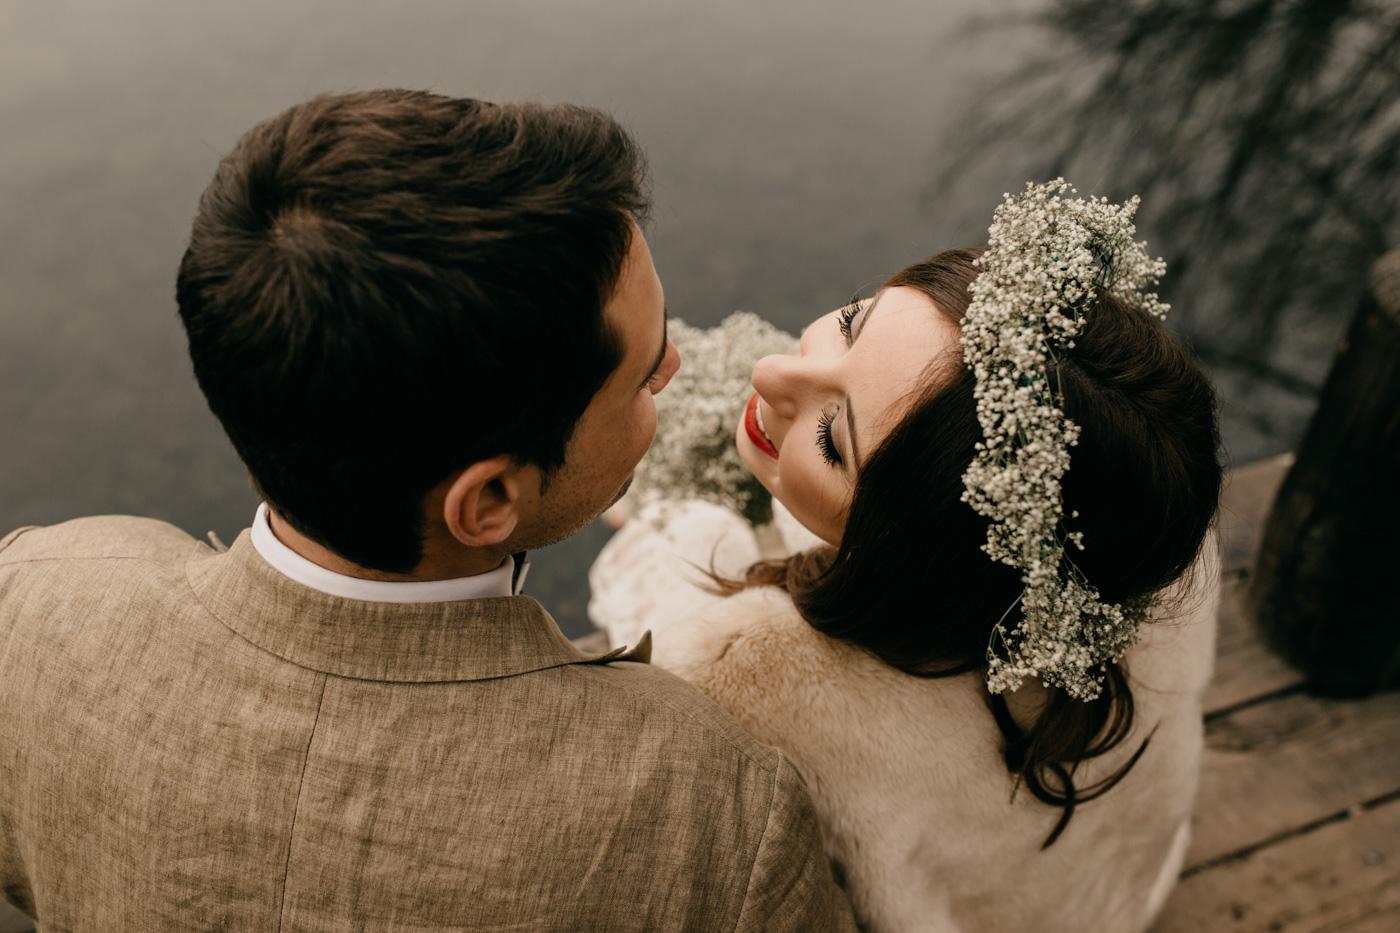 Velvet-Hush-fotografos-boda-al-aire-libre-madrid-089